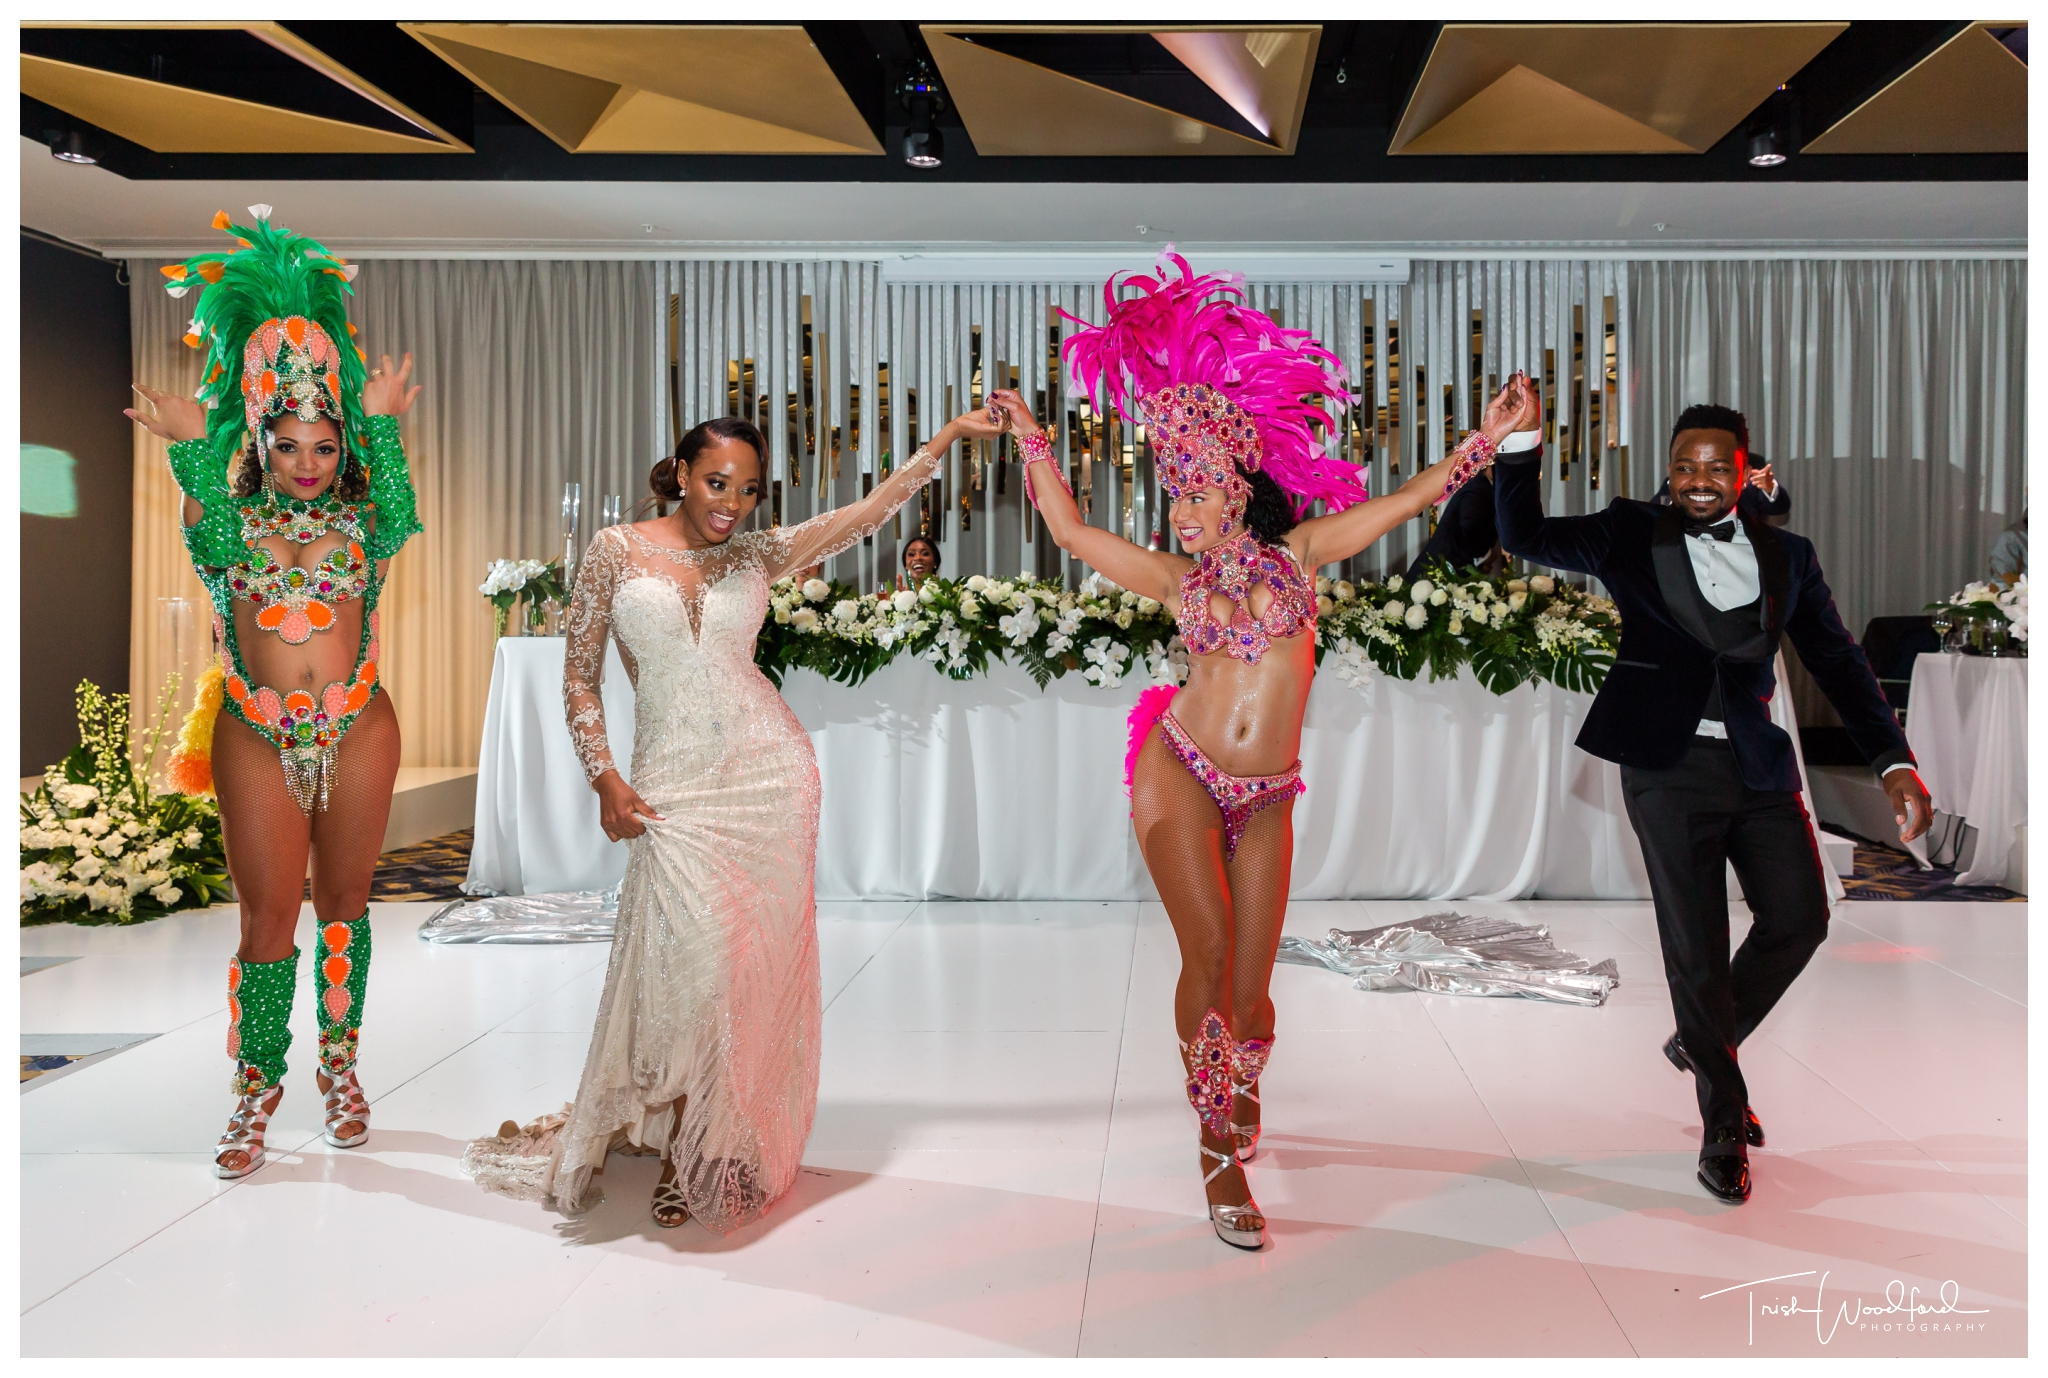 Sambrazil Dancers Wedding Beaumonde on the Point